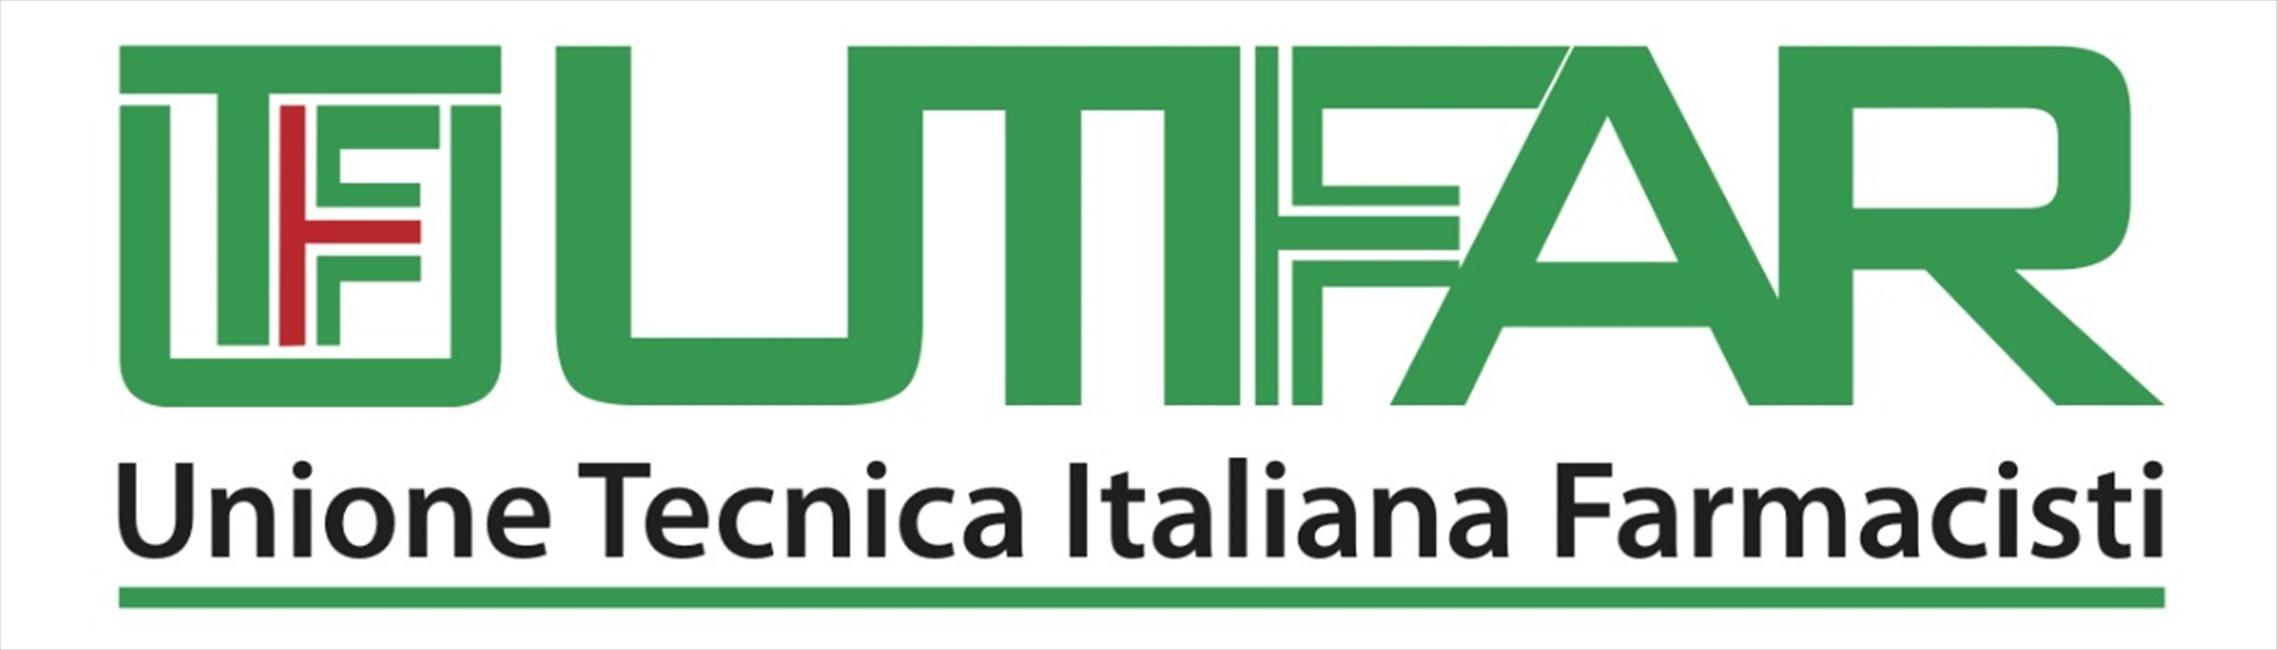 UTIFAR - UNIONE TECNICA ITALIANA FARMACISTI